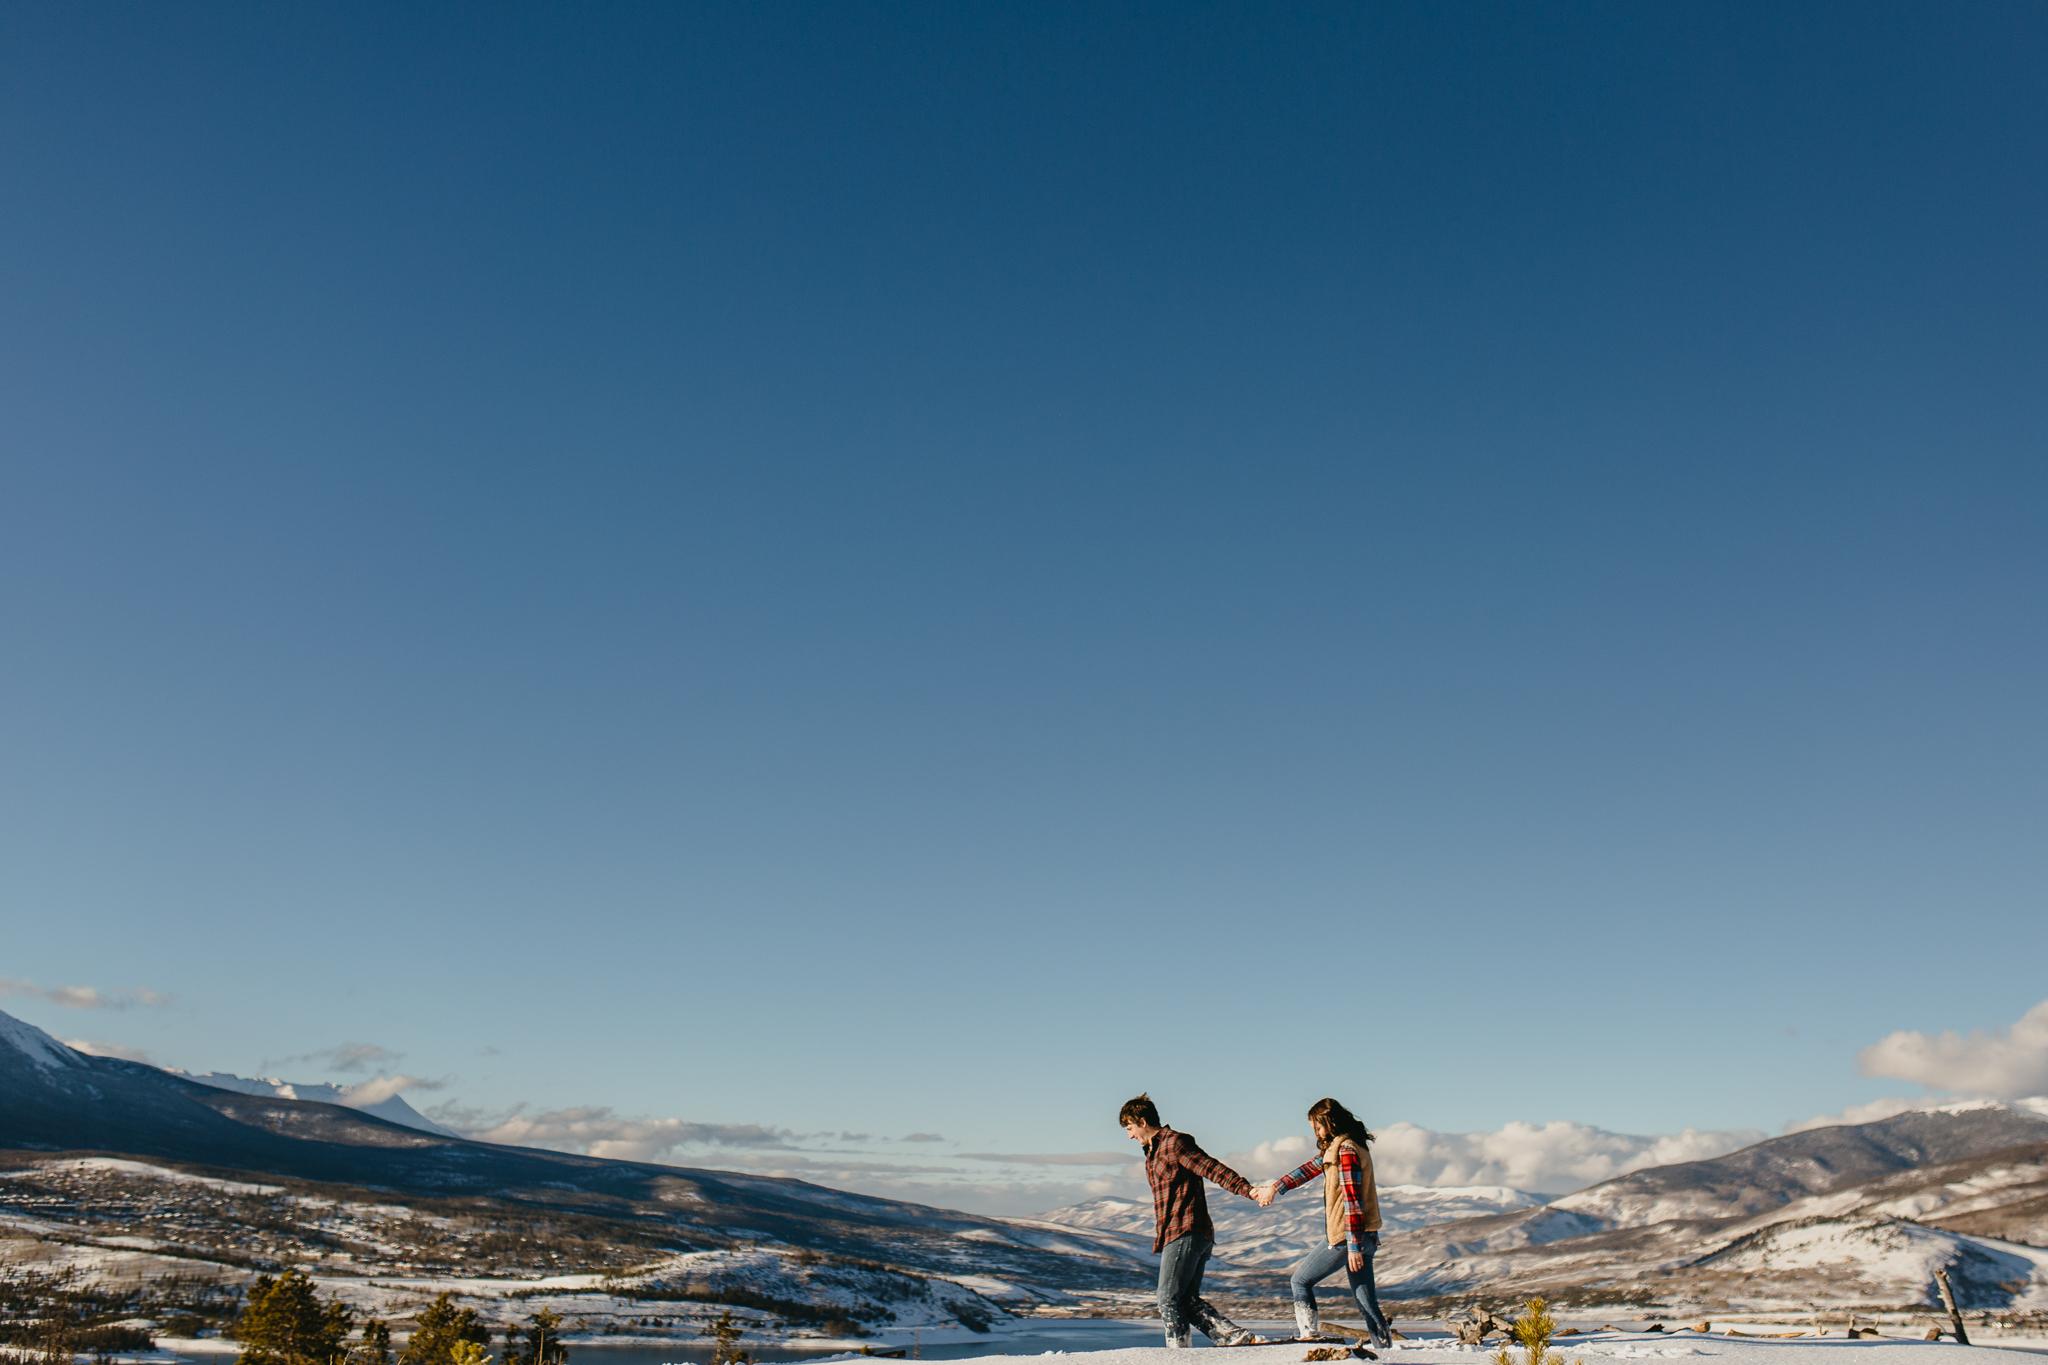 breckenridge-engagement-photography-sapphire-point-18.jpg